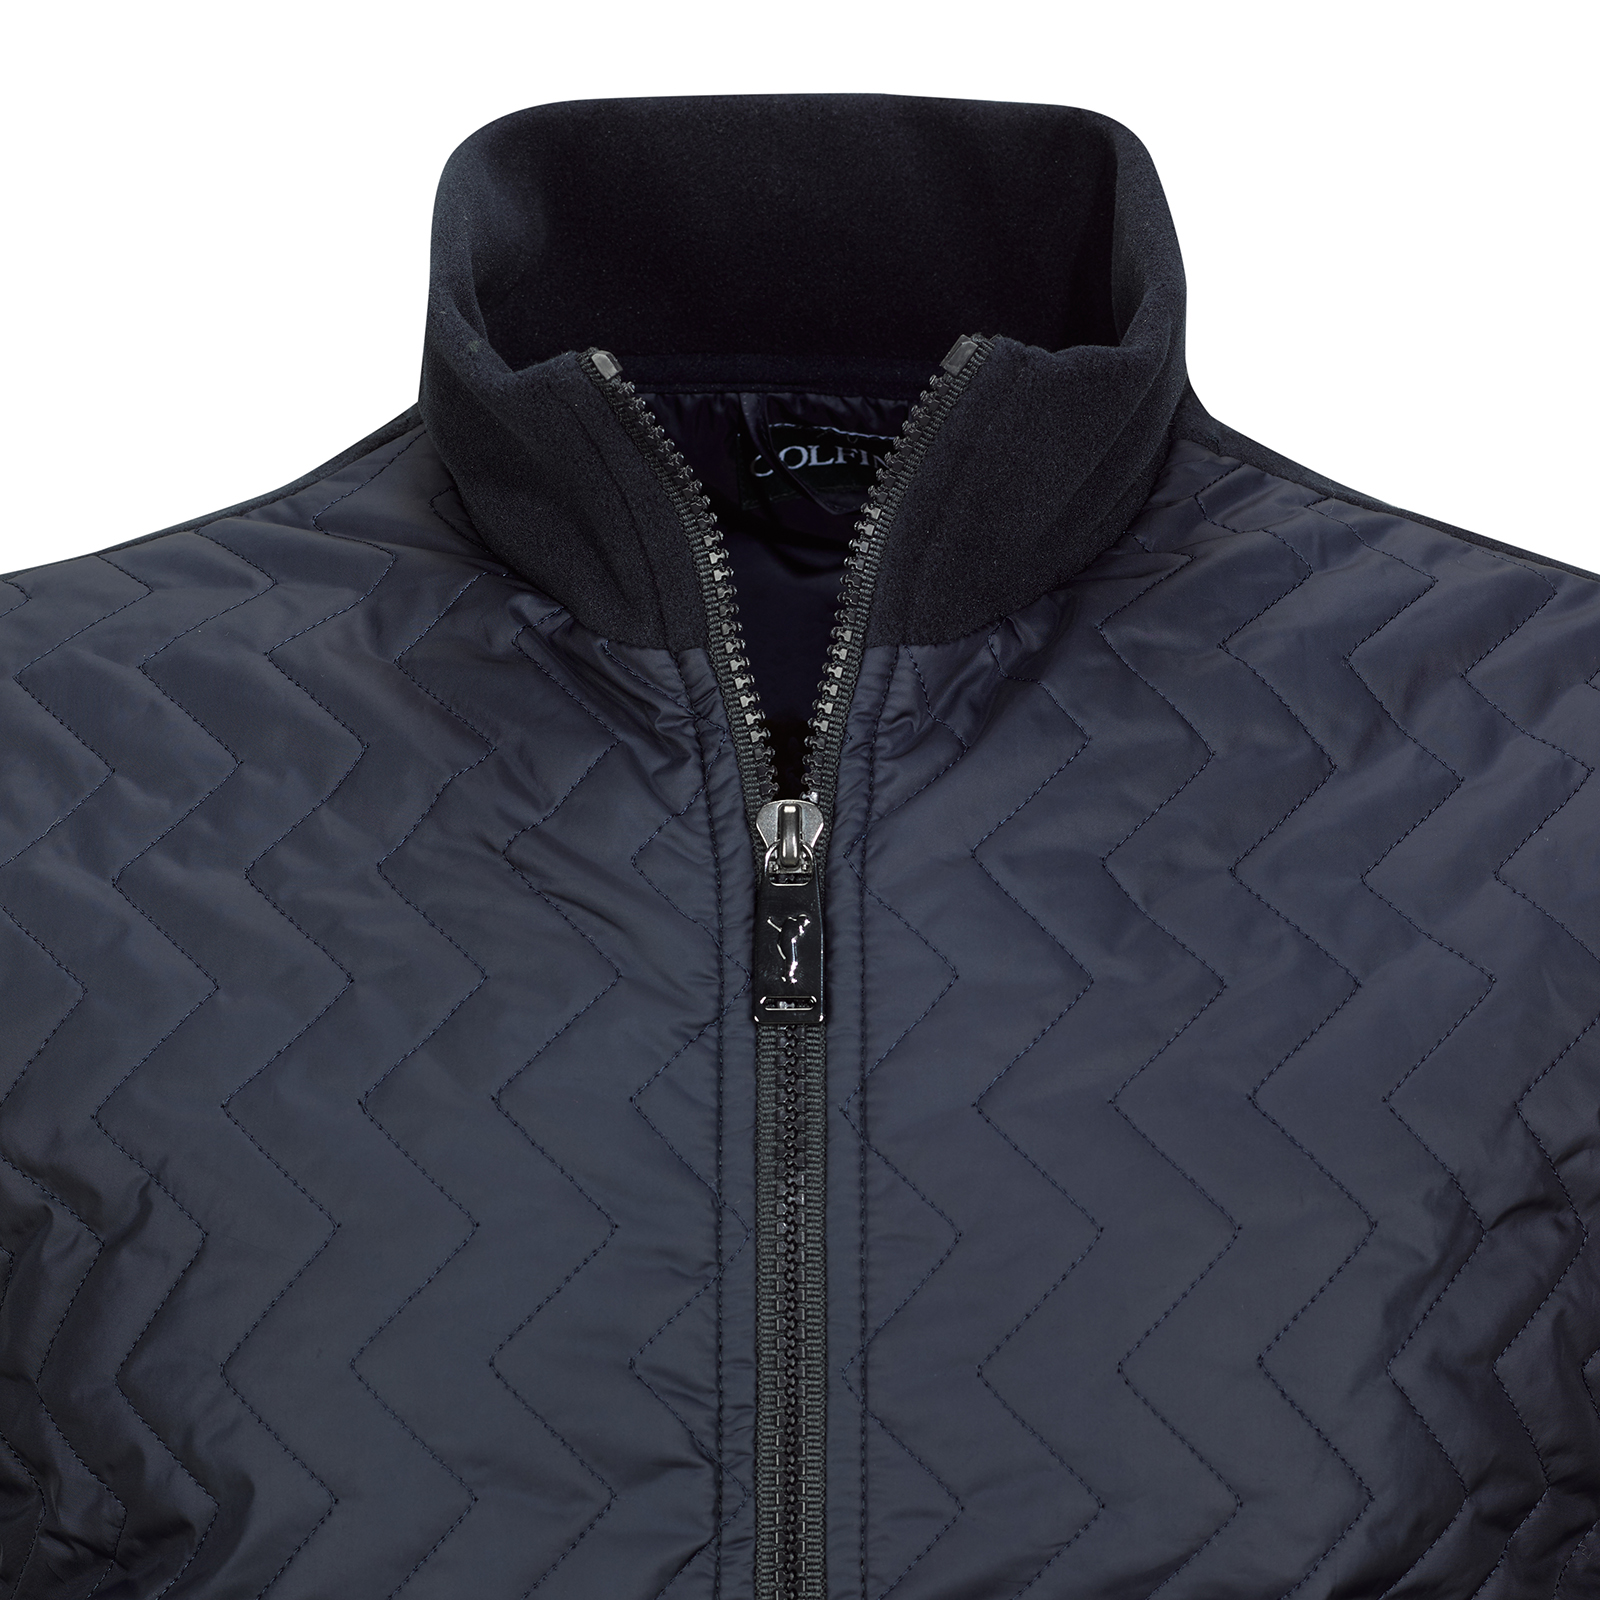 Herren Fleece Golfjacke Cold Protection mit Steppelementen aus Microfaser